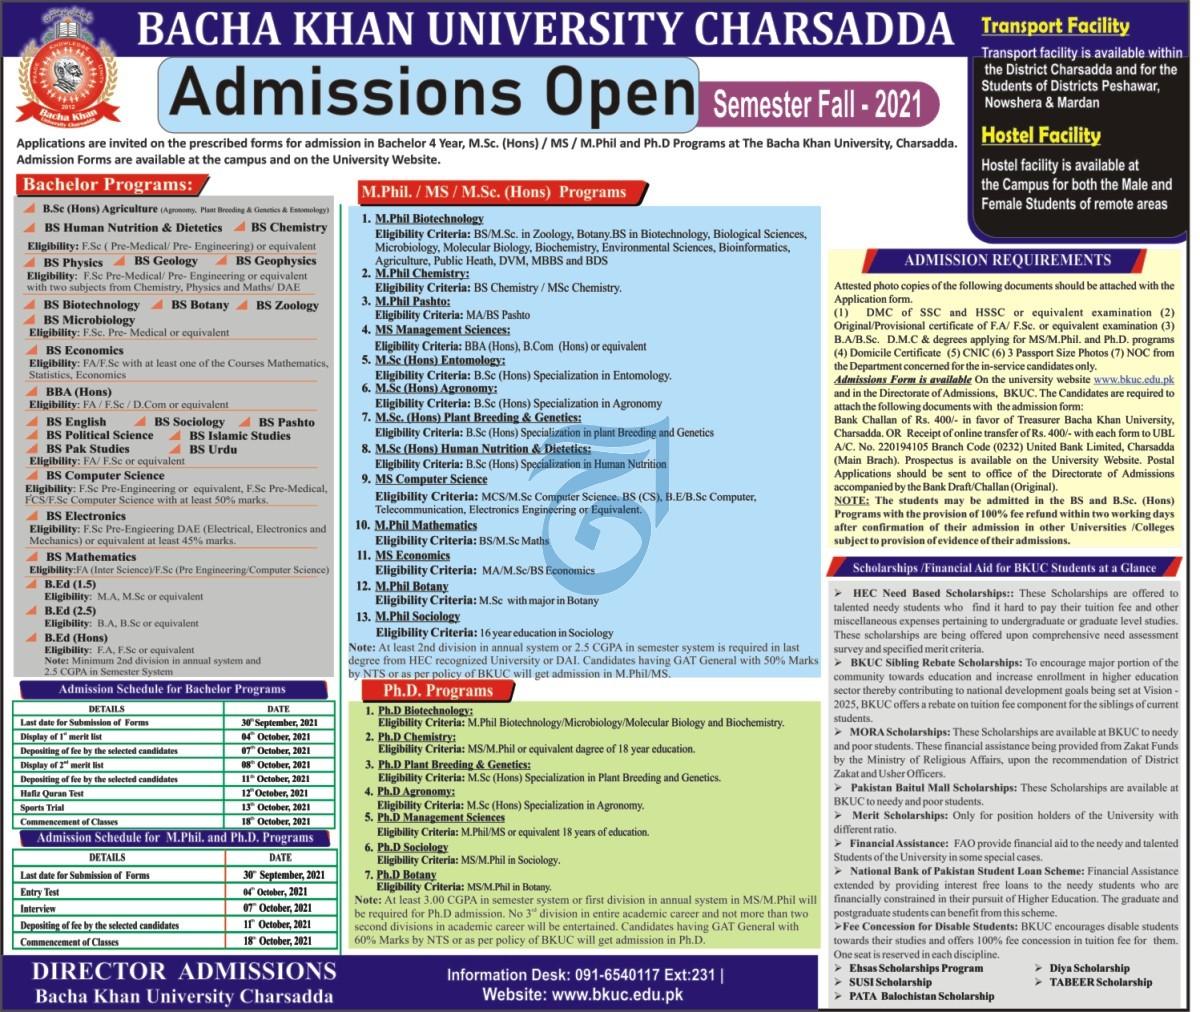 Bacha Khan University Charsadda BKUC Admission 2021